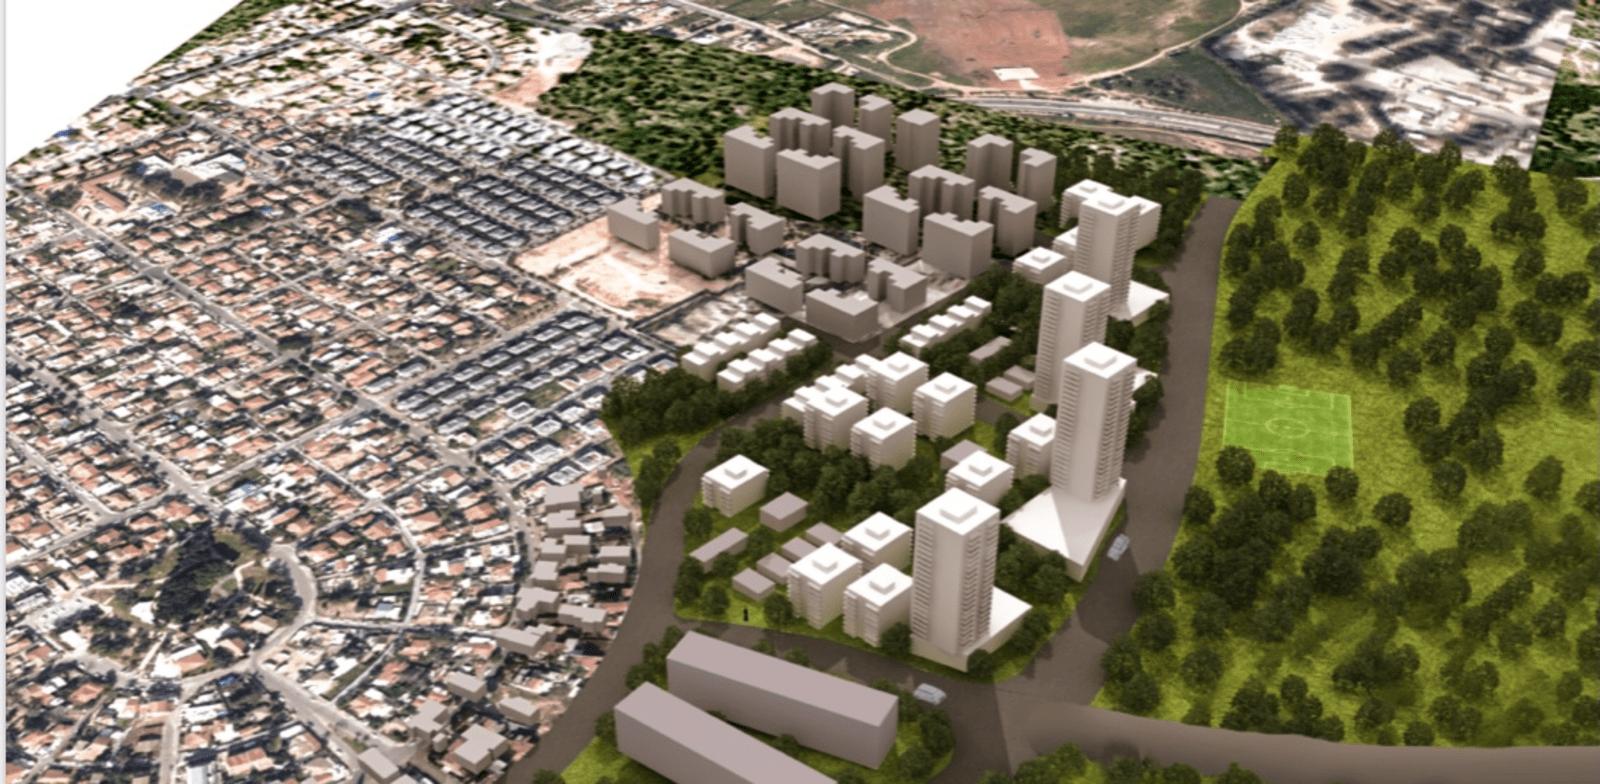 Rishon Lezion Hahatzavim neighborhood Credit: Horovitz Architects